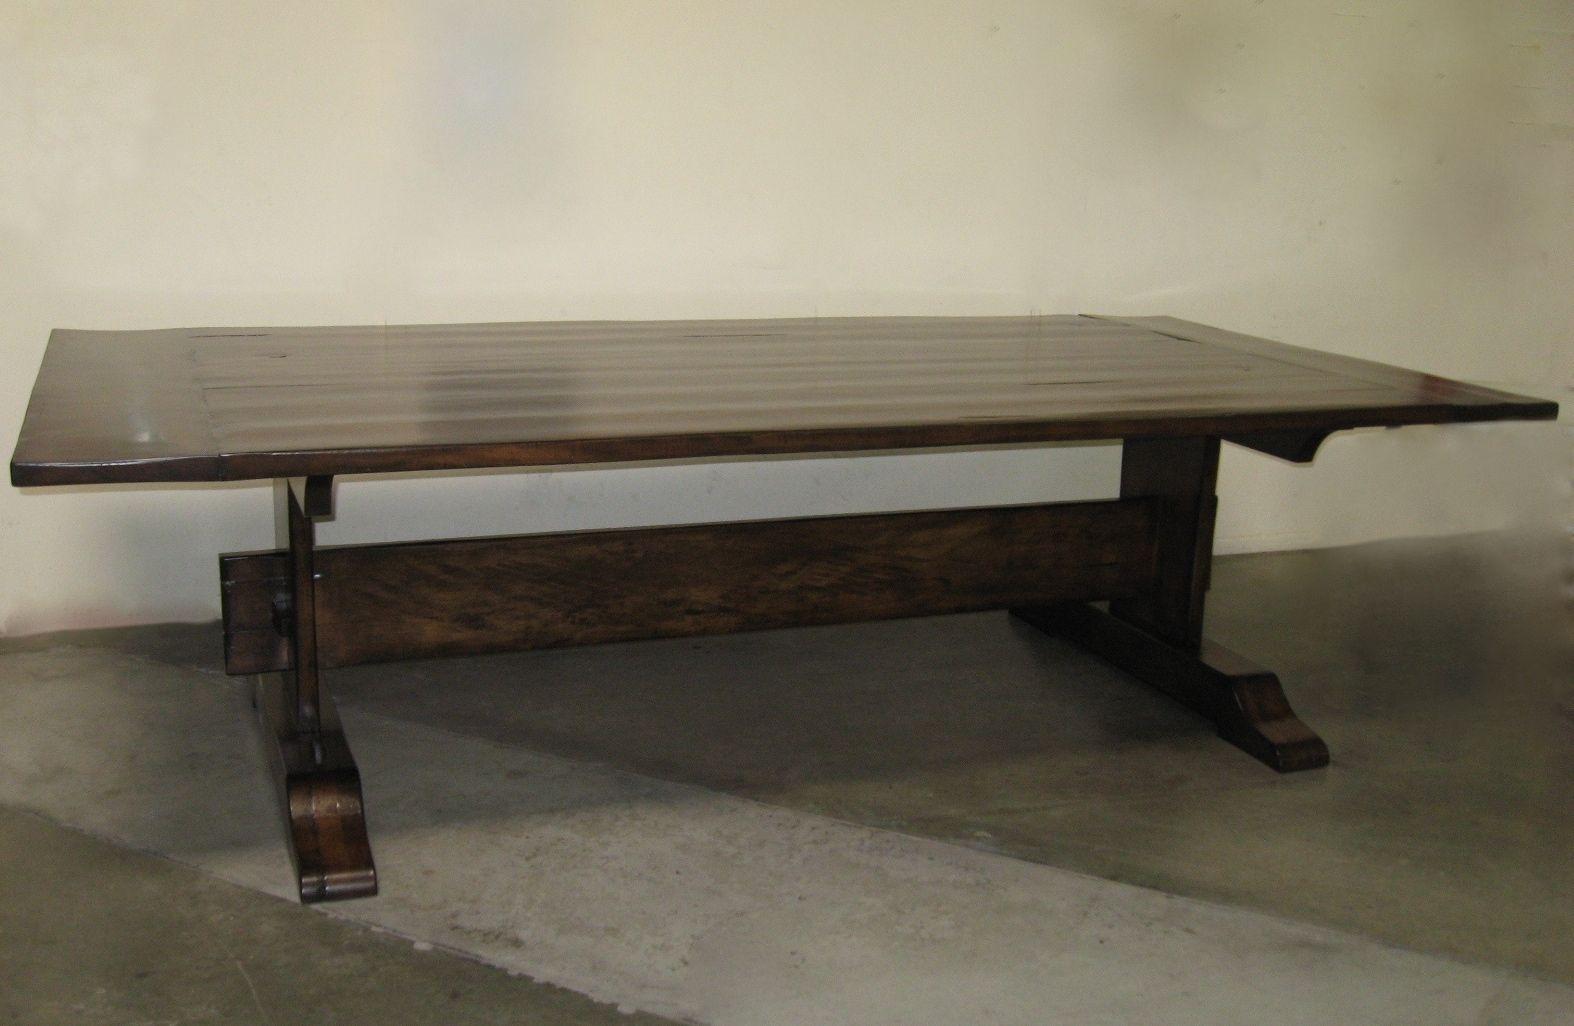 Küchenbar design-viertel quatrine dubblin dining table  dining table  pinterest  dining